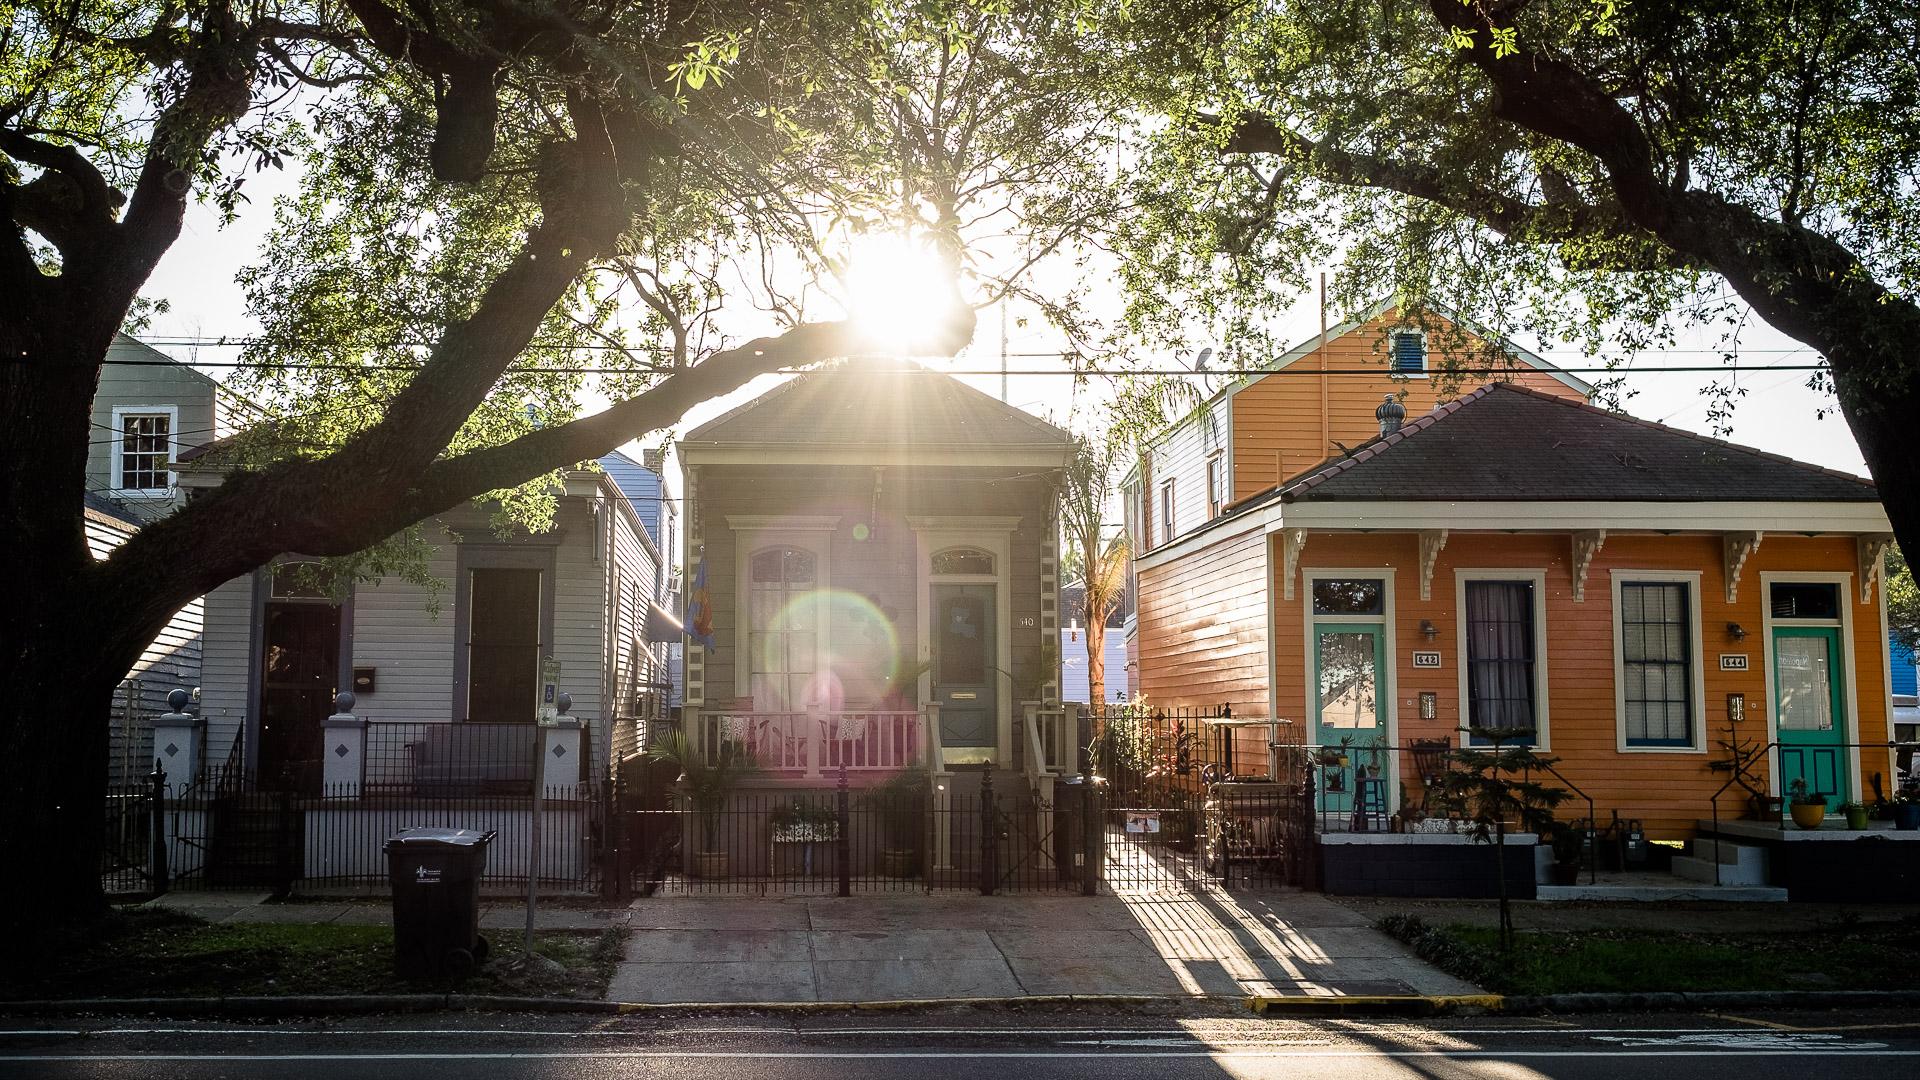 170401-New_Orleans-174-1080.jpg